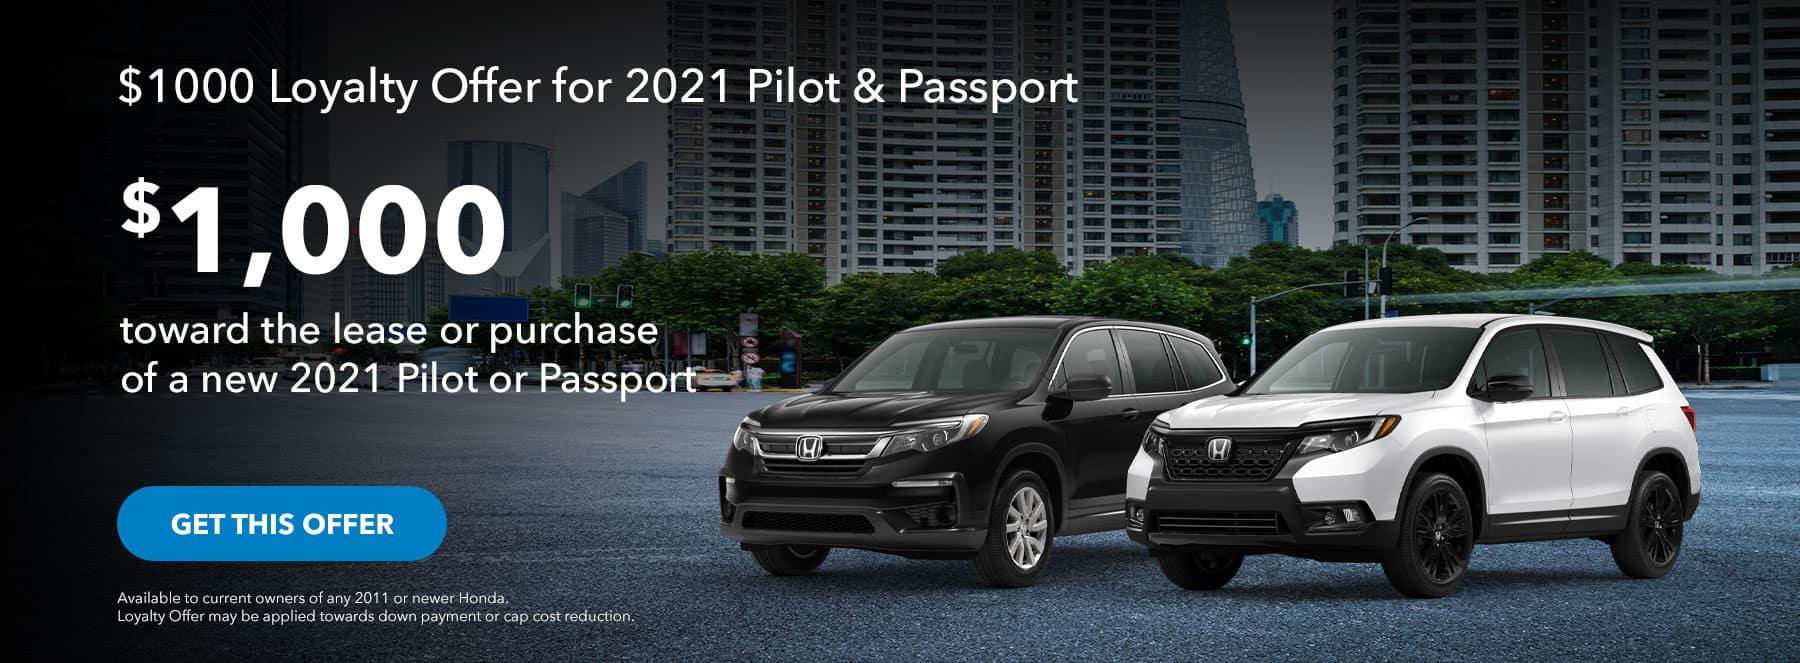 $1000 Loyalty Offer for 2021 Pilot & Passport's